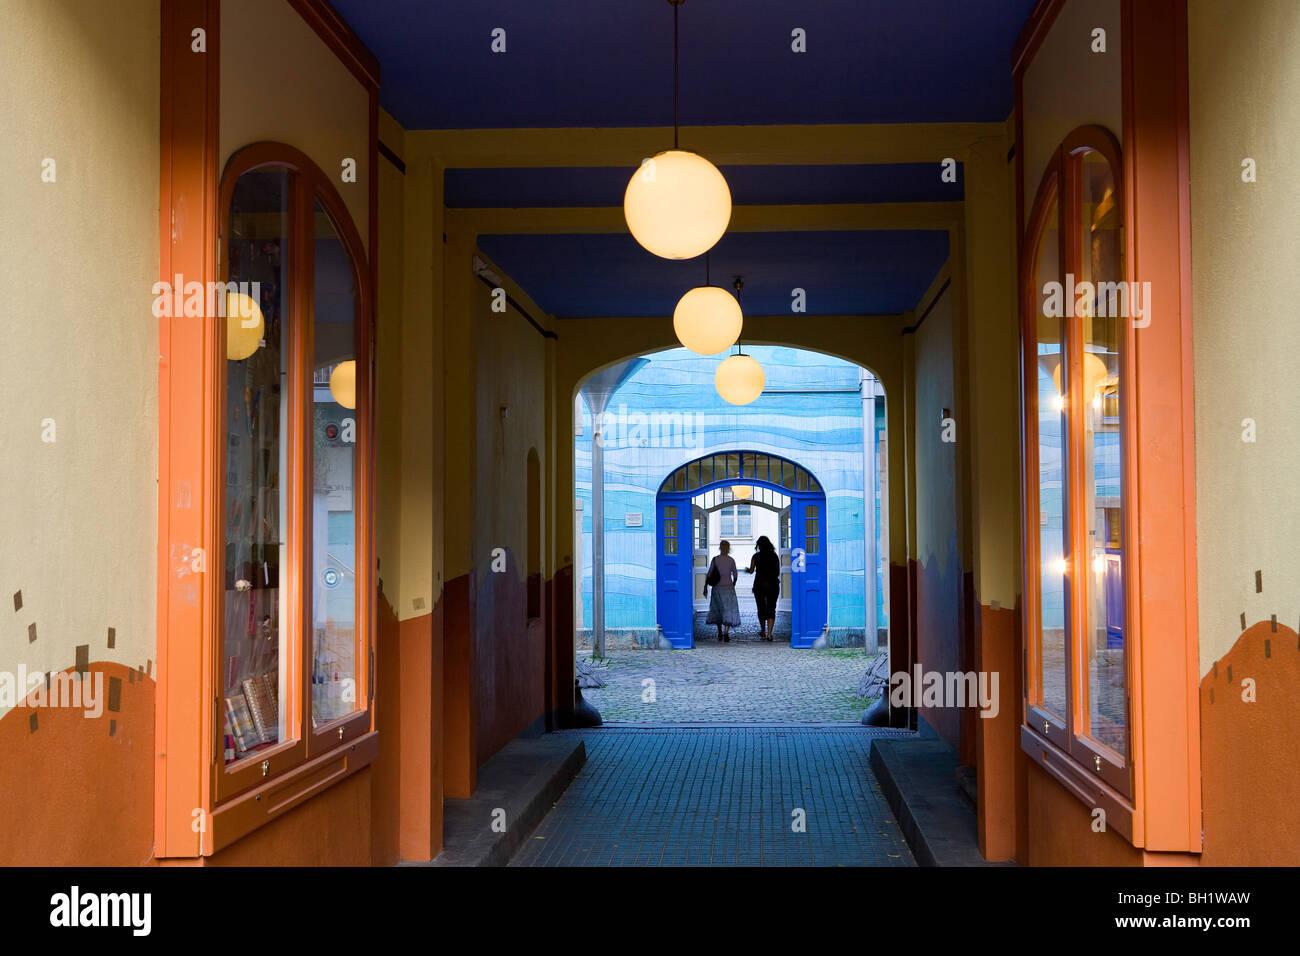 Courtyard of elements, Hof der Elemente in the Kunsthofpassage, Dresden, Saxony, Germany, Europe - Stock Image